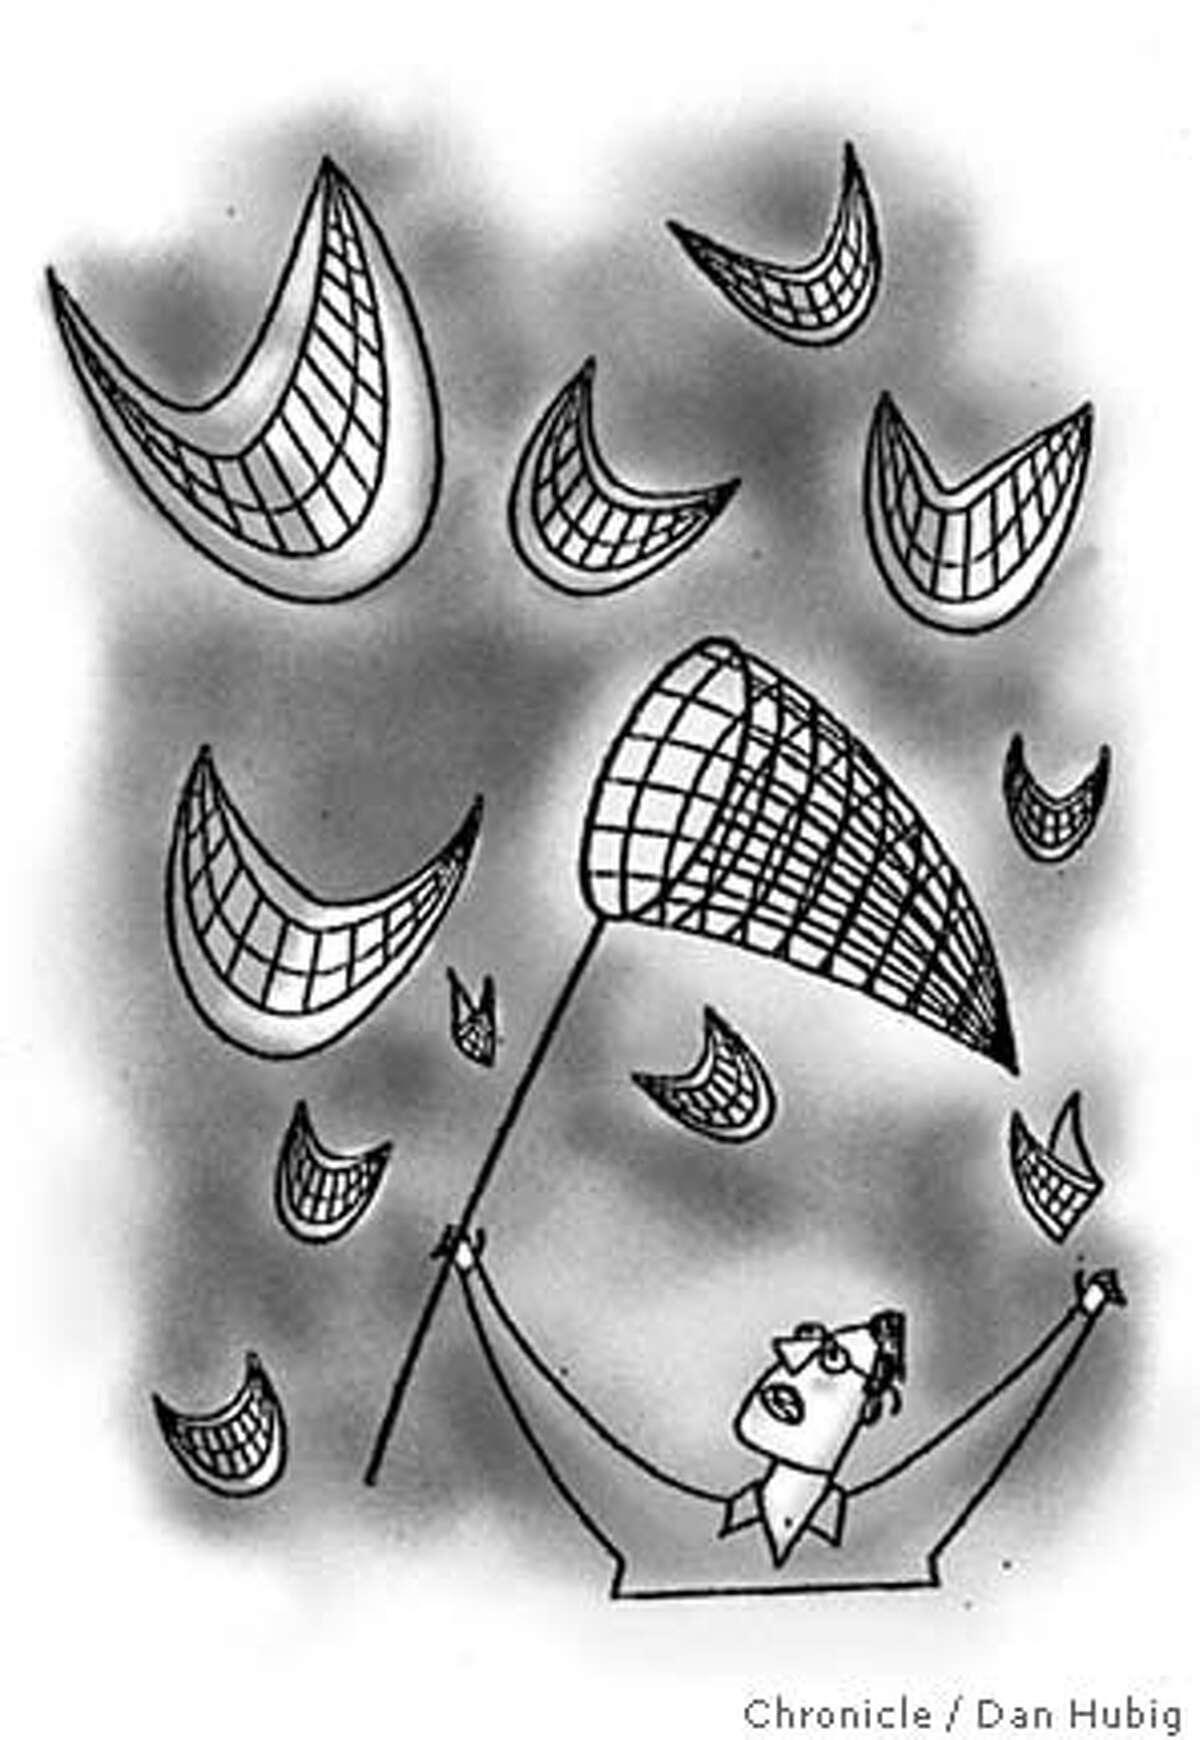 Chronicle illustration by Dan Hubig